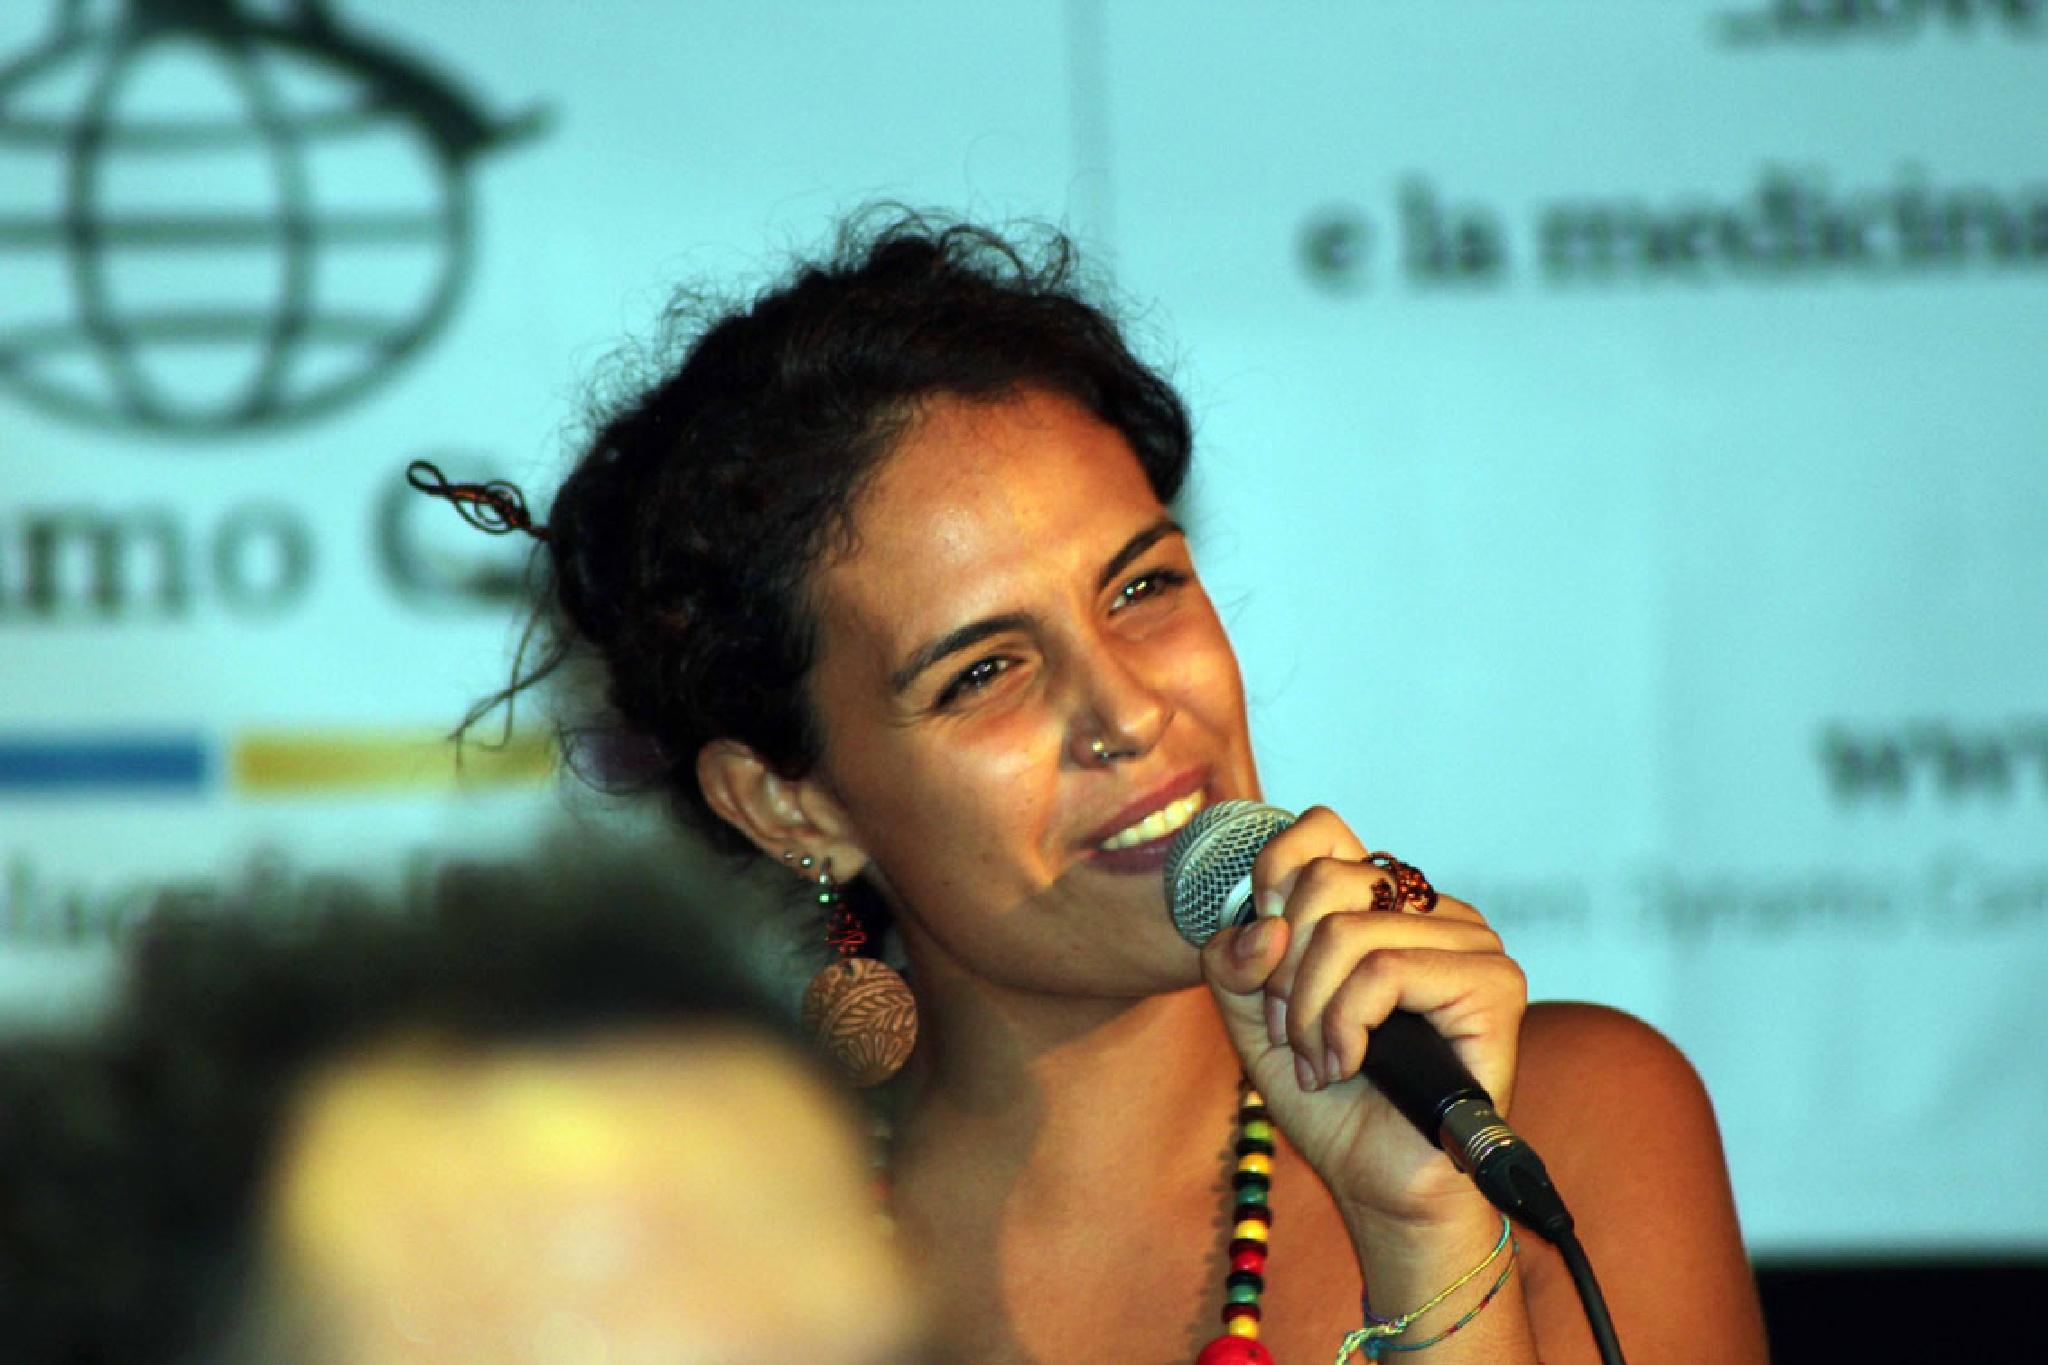 Smiling Jana by mario.carone